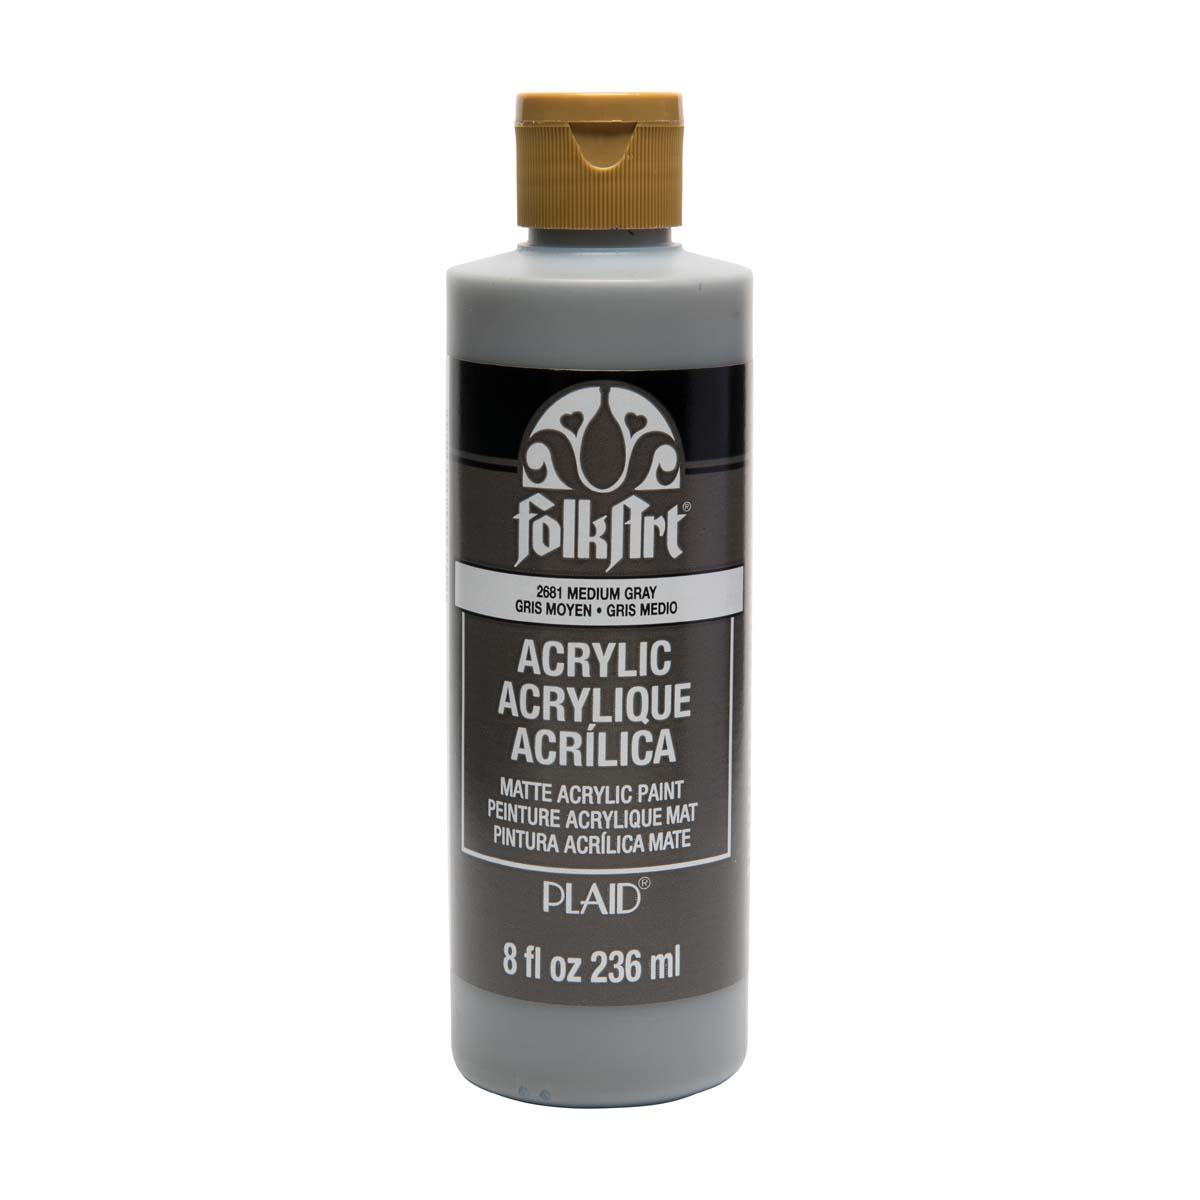 FolkArt ® Acrylic Colors - Medium Gray, 8 oz.